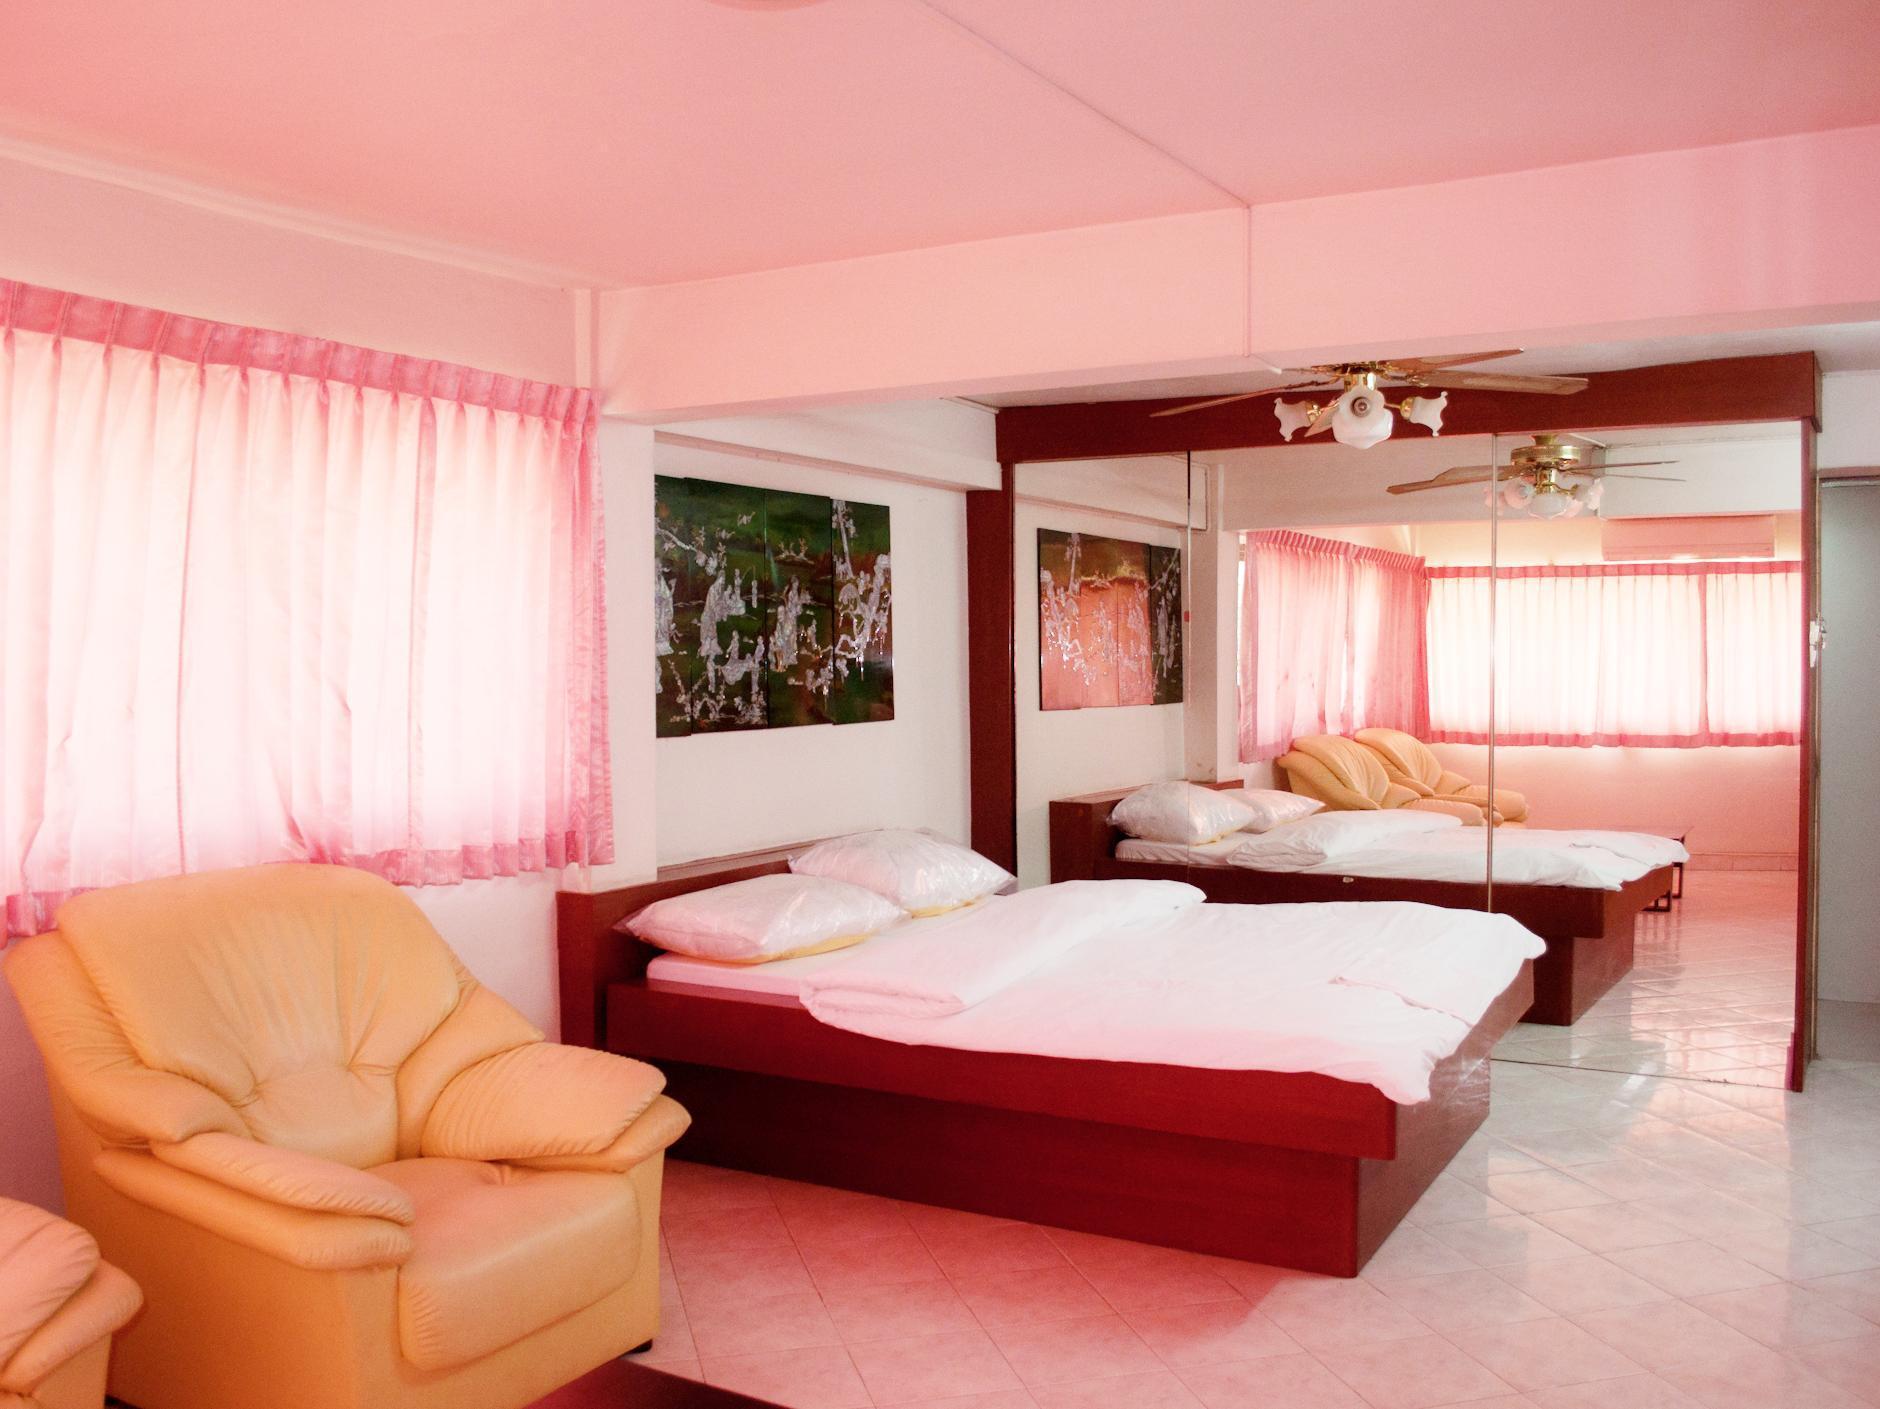 Hornet House Pattaya